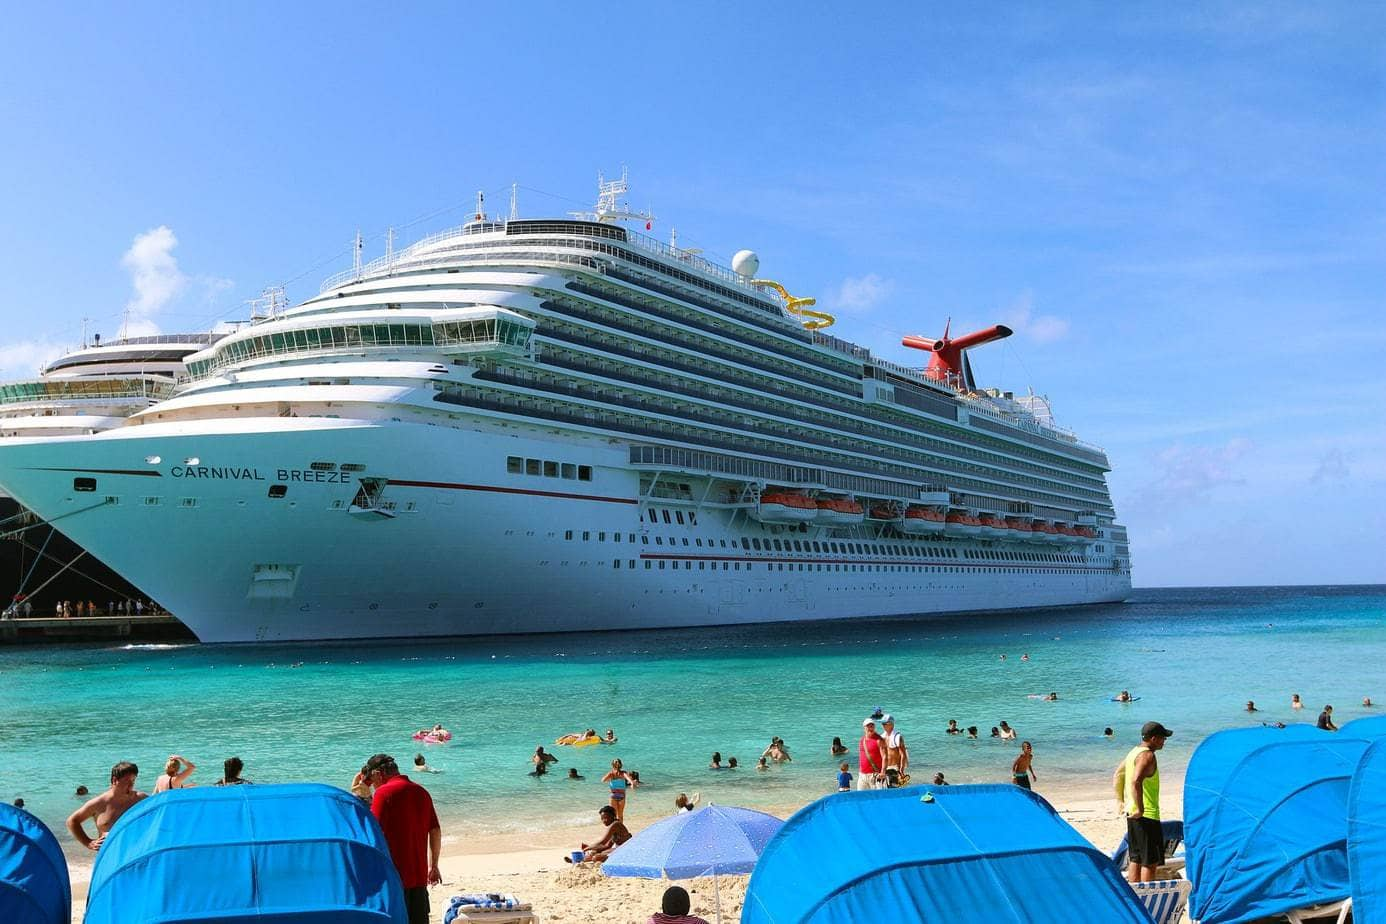 Carnival Cruiseline ship docked in the tropics